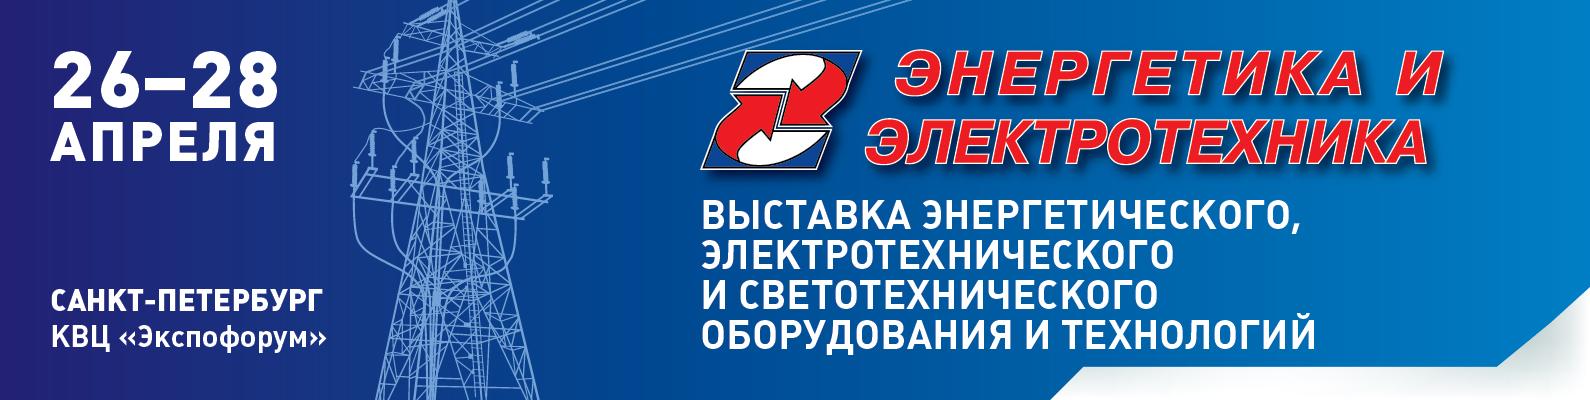 "Выставка ""Энергетика и электротехника - 2022"", Санкт-Петербург, 26-28 апреля 2022"